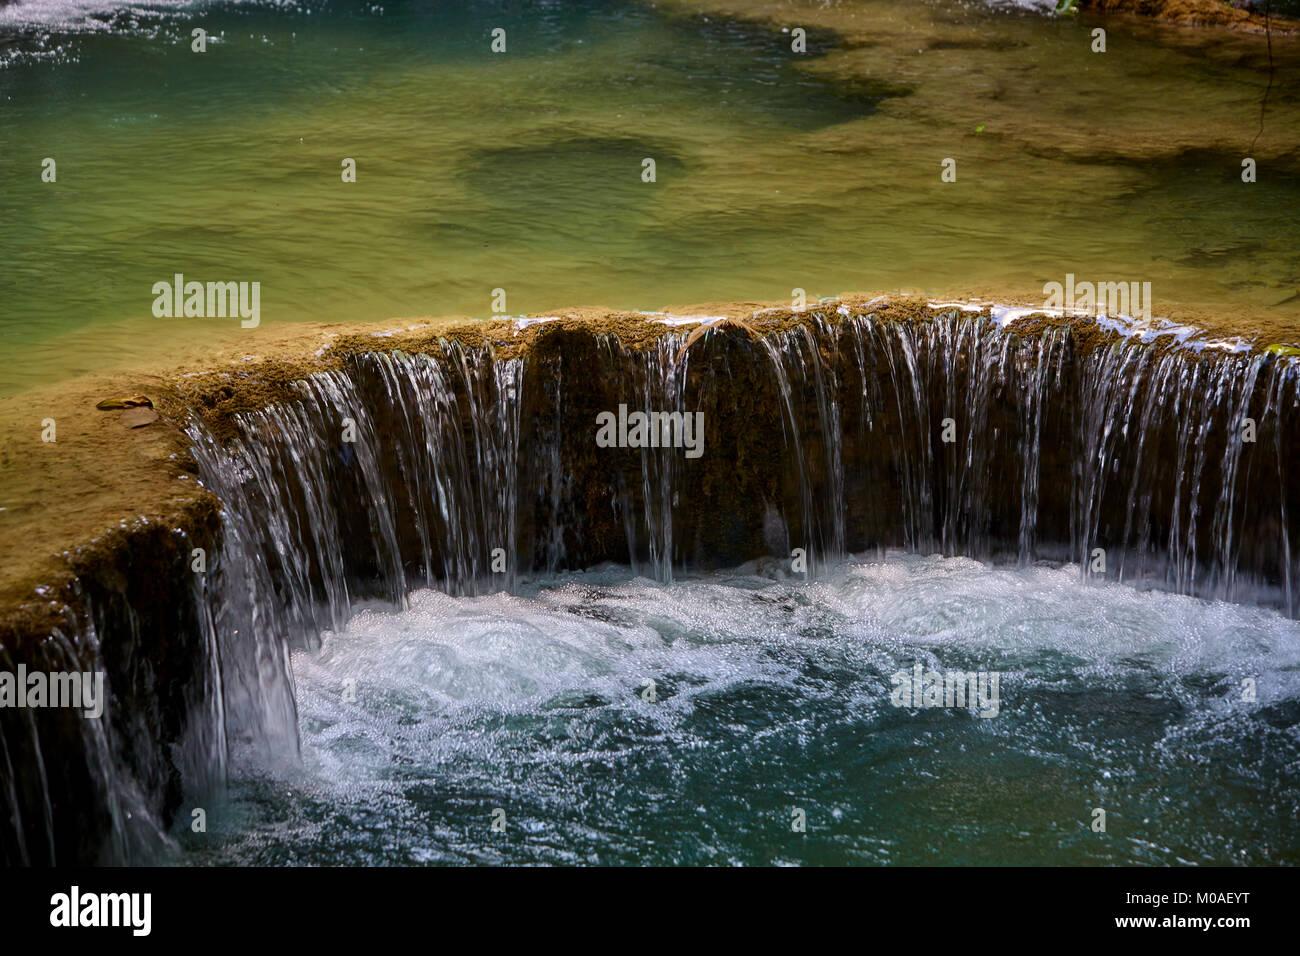 Kuang Si Falls near Luang Prabang - Stock Image